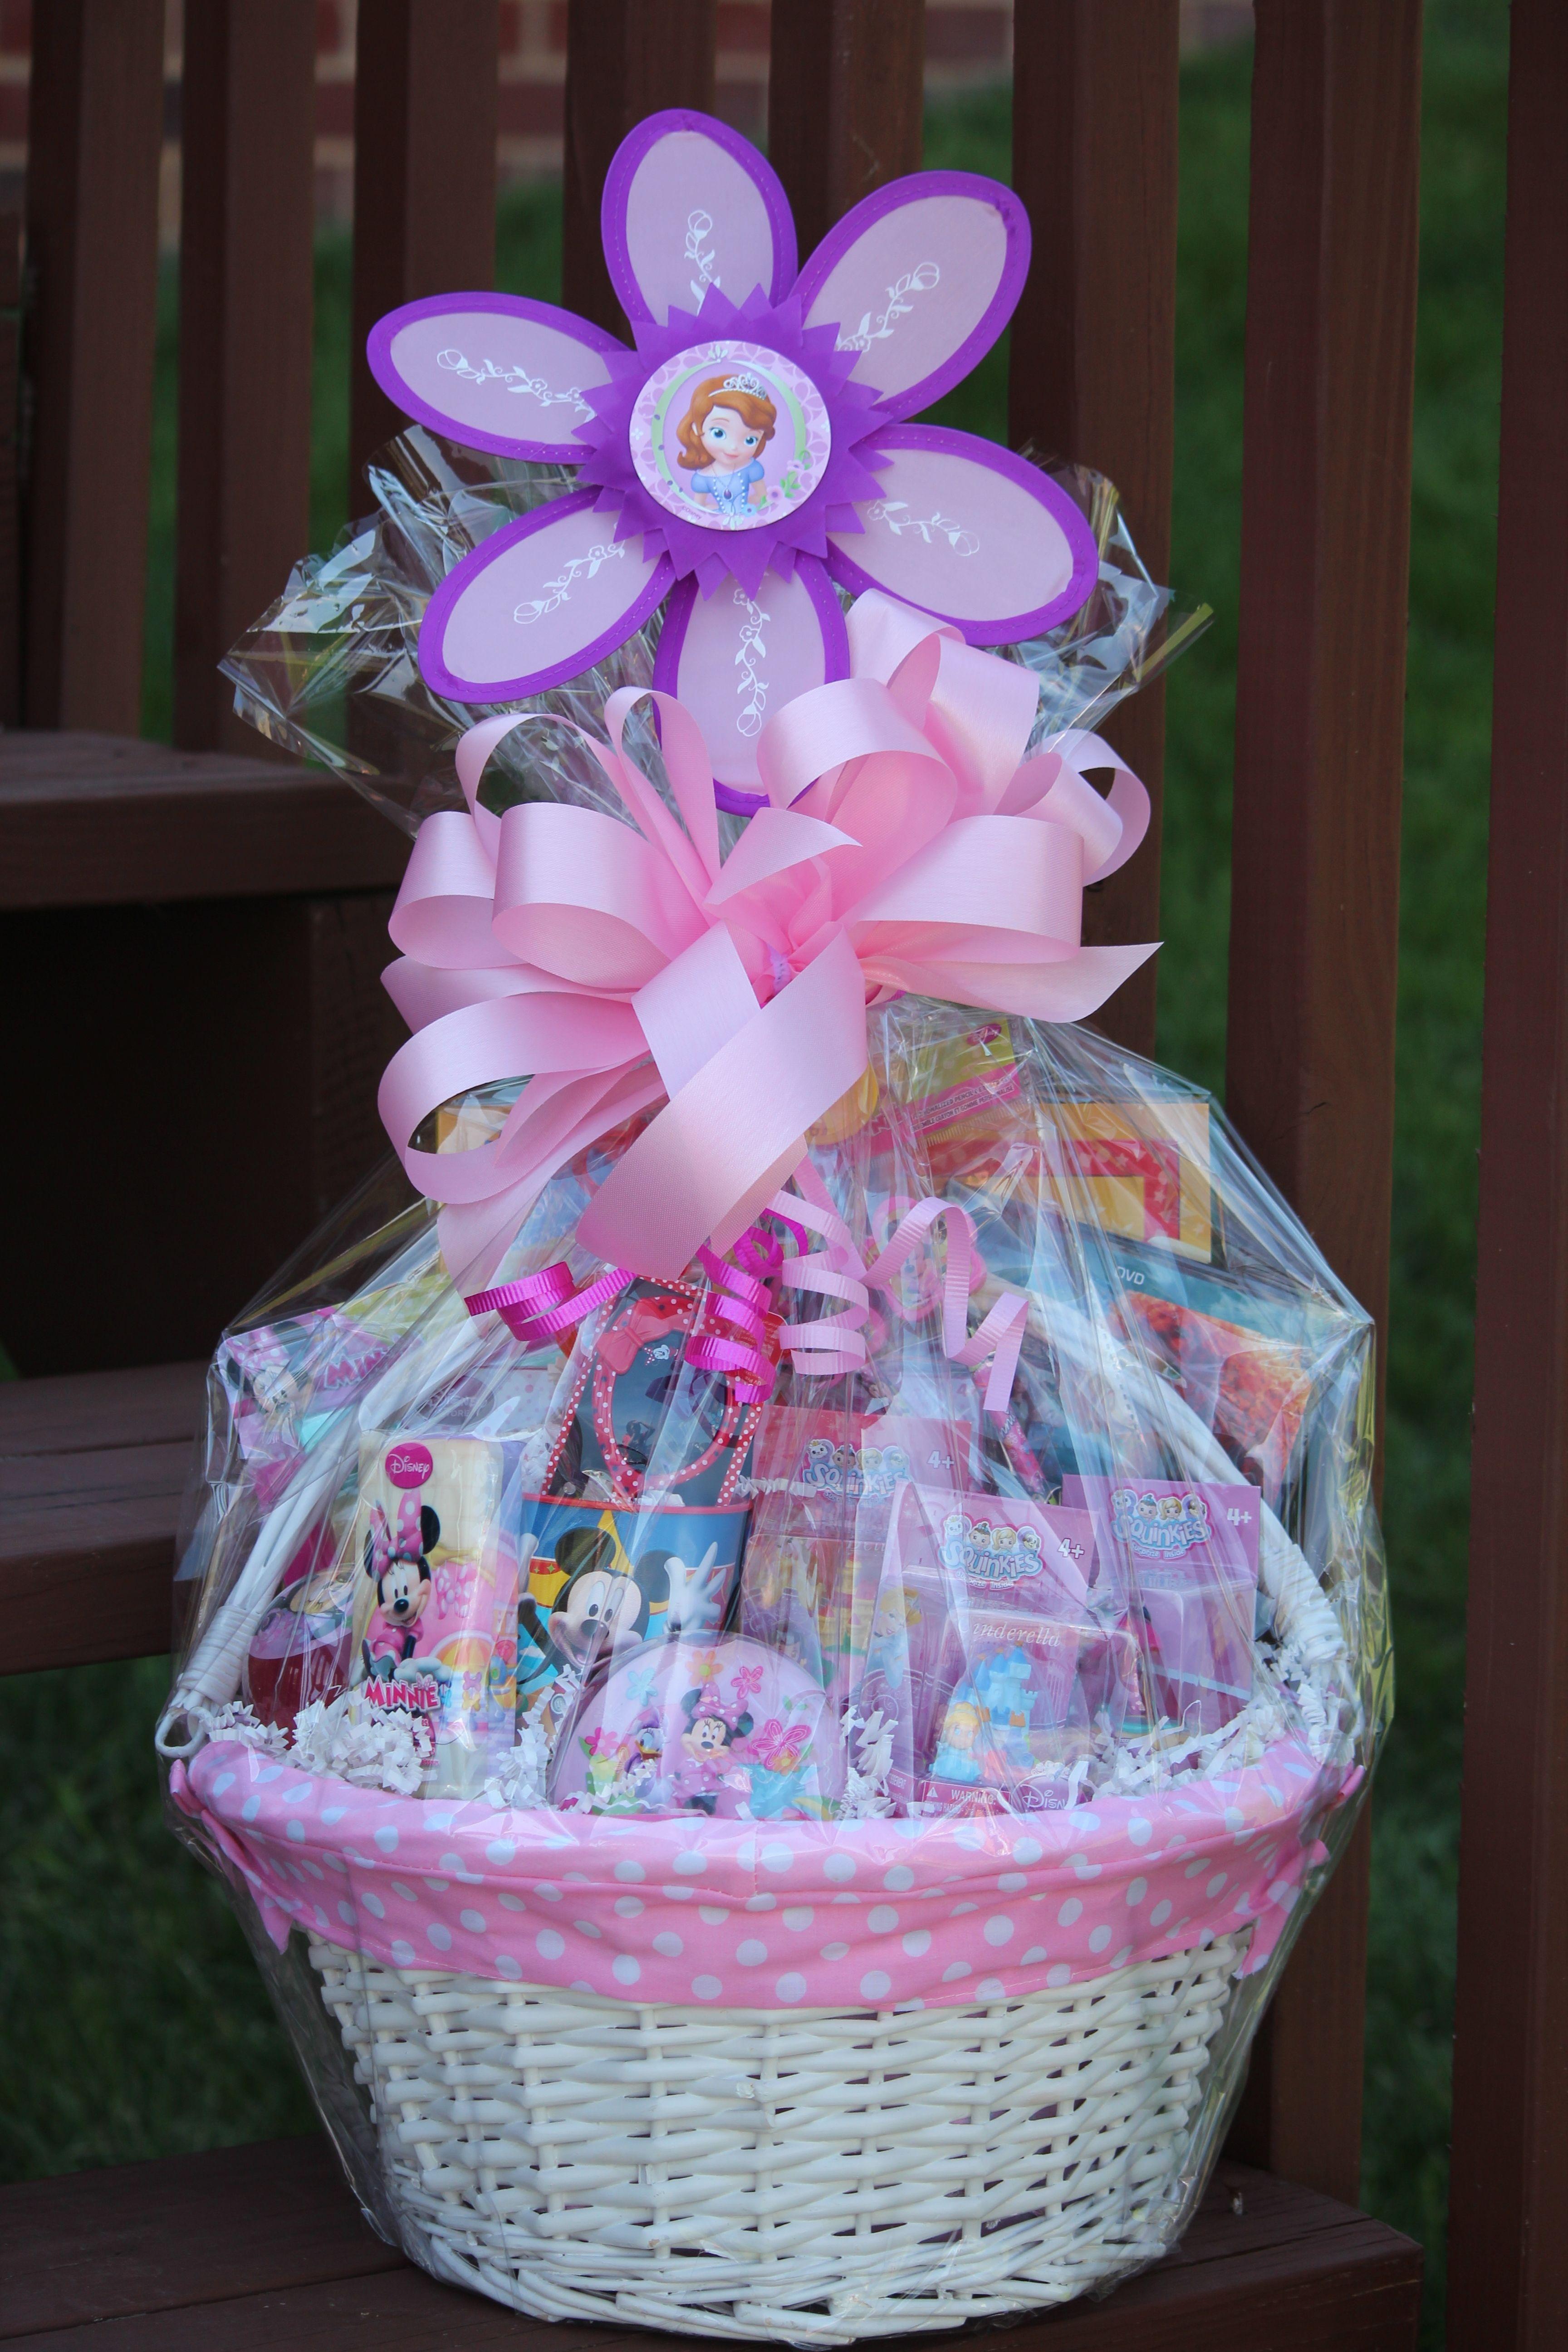 Disney easter baskets homemade easter baskets kids gift